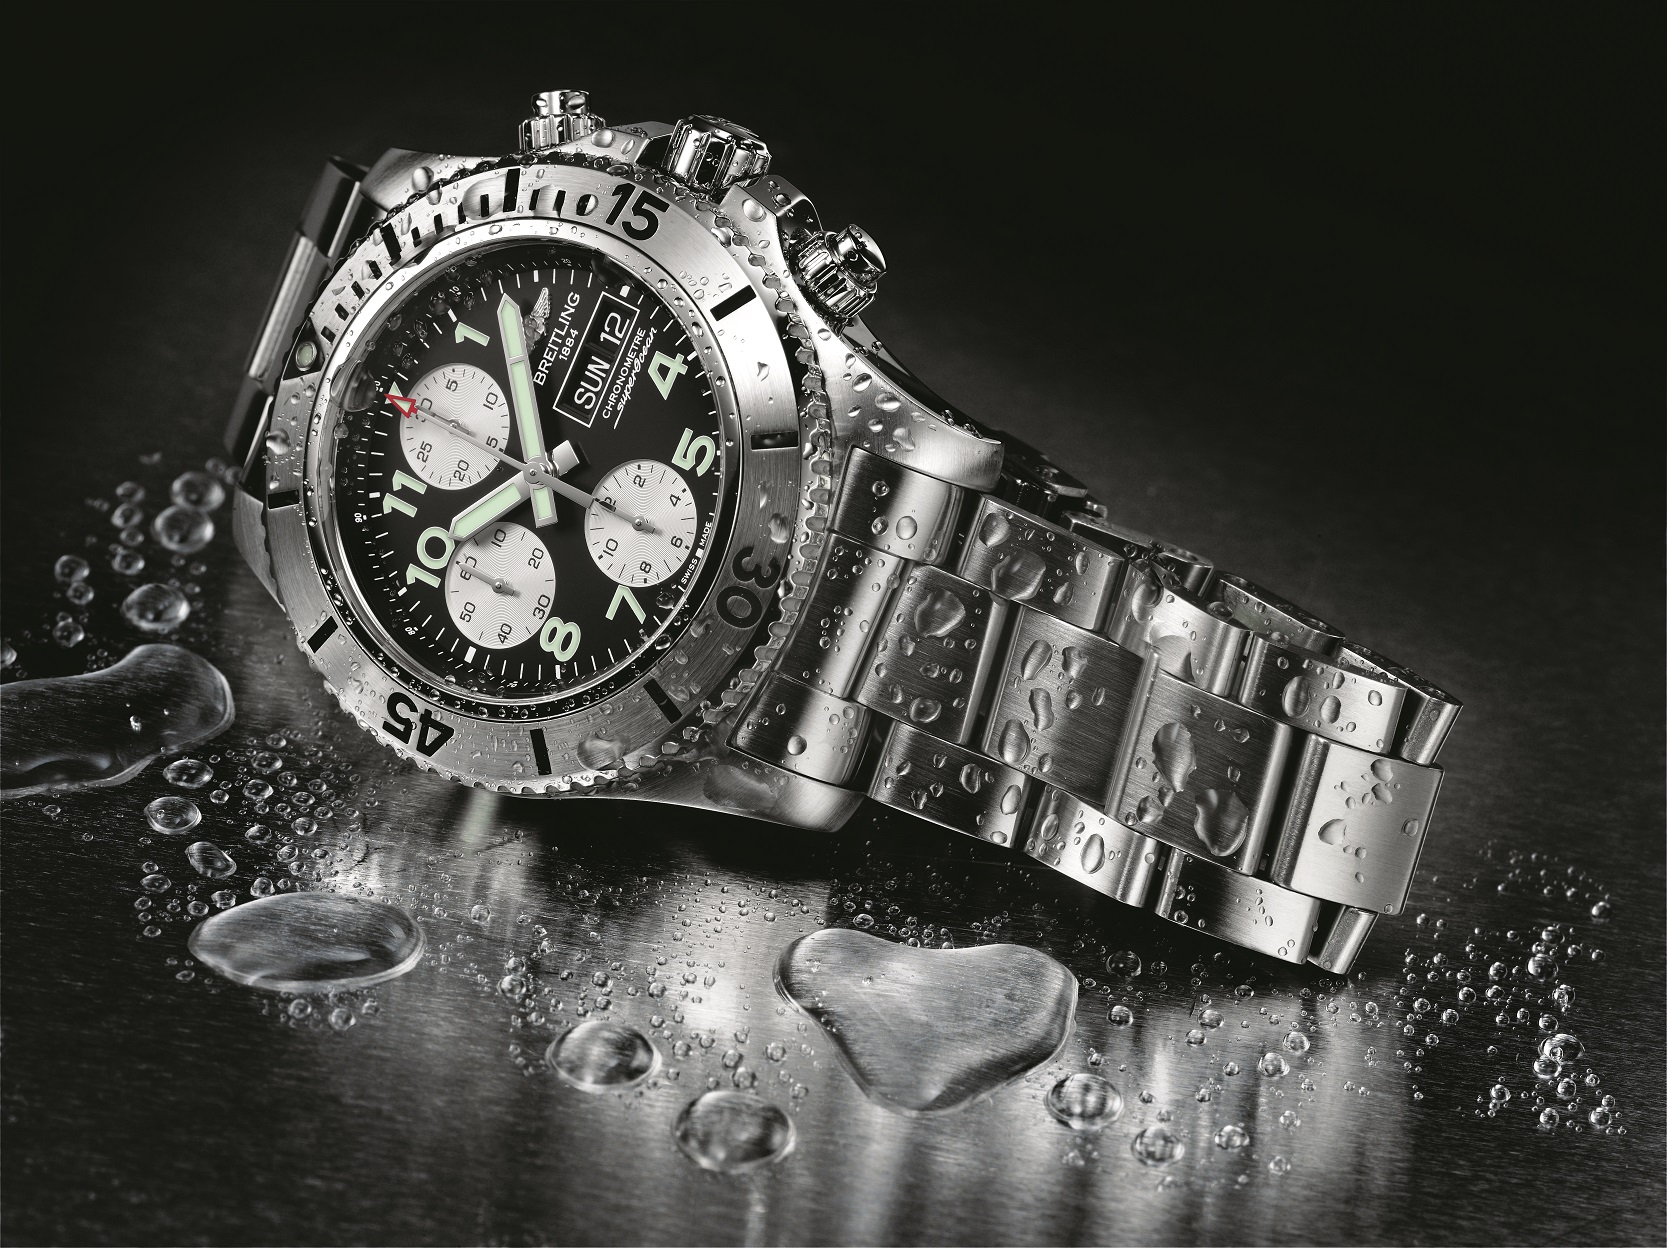 O novo relógio Breitling Superocean Chronograph Steelfish